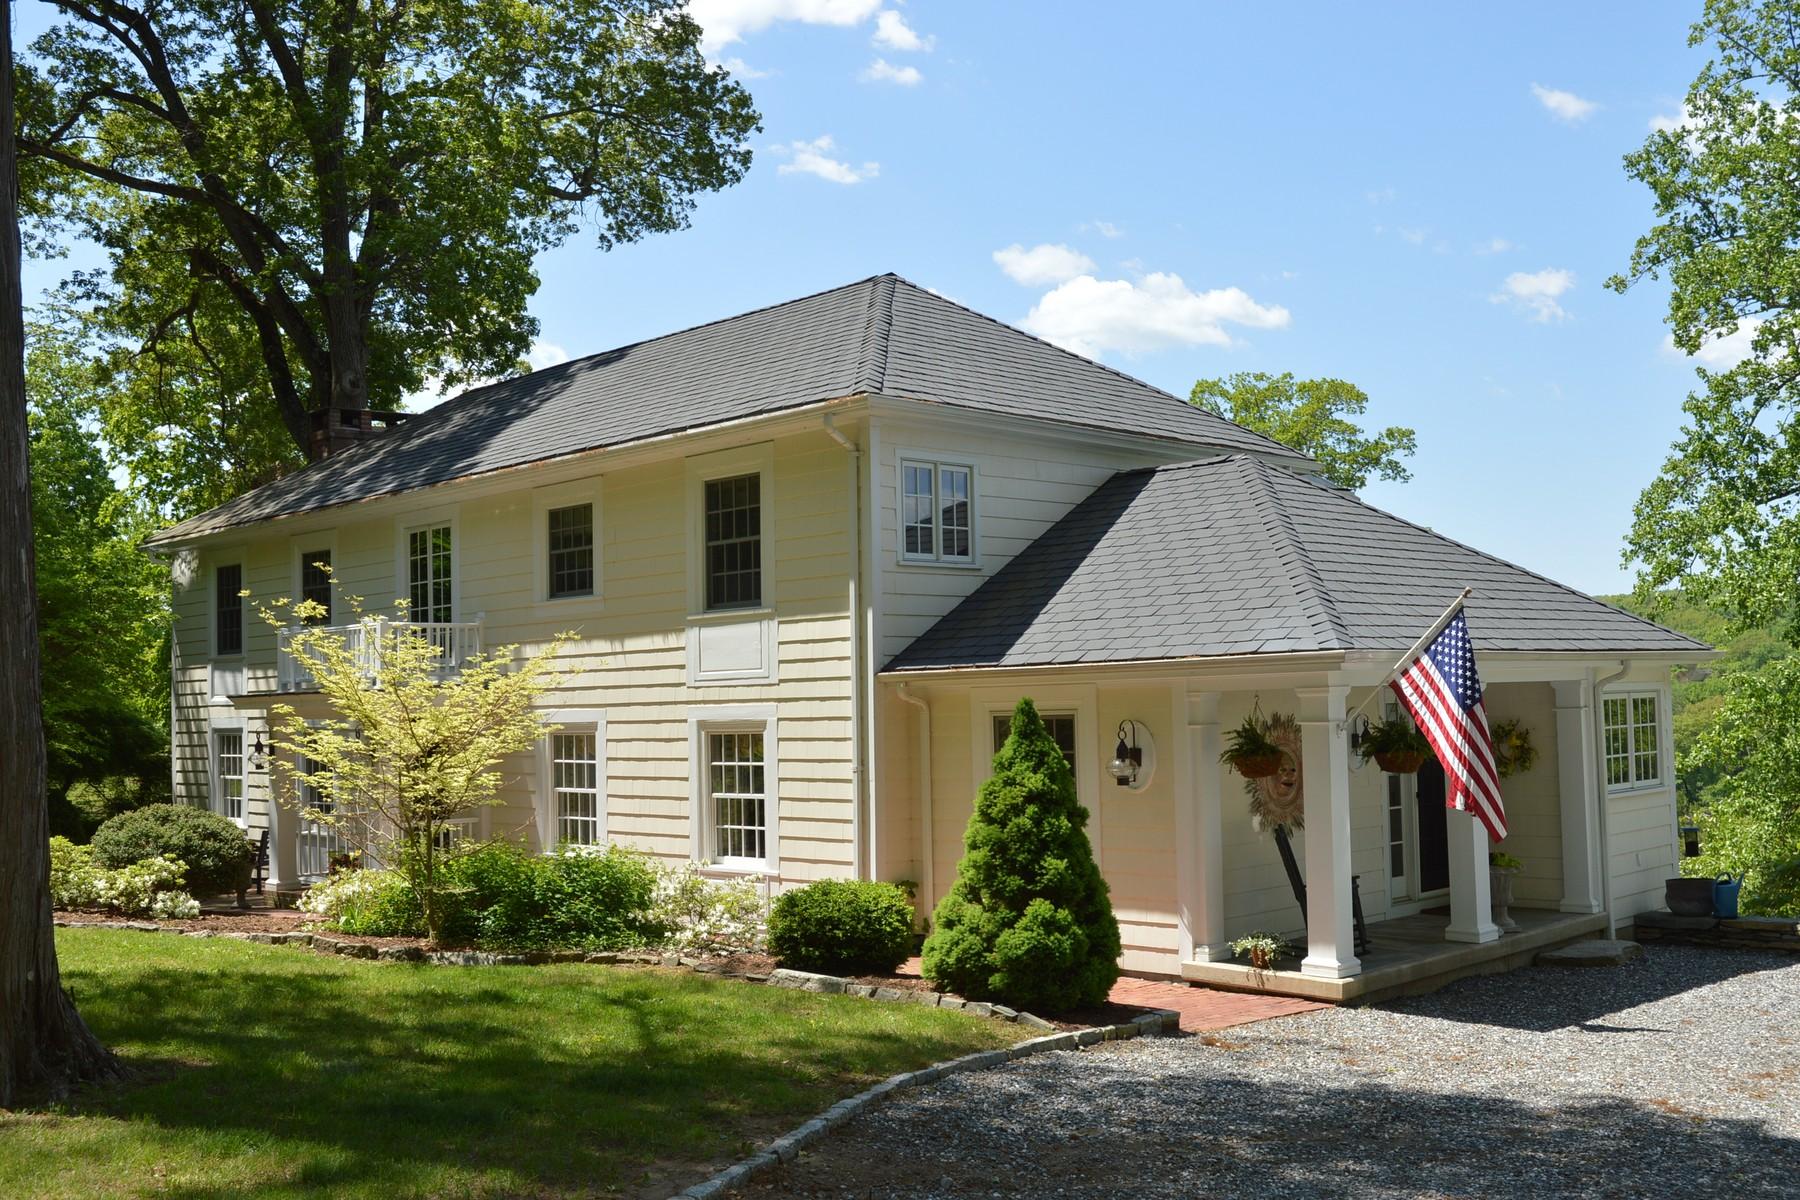 独户住宅 为 销售 在 Paradise on the Connecticut River 153 Middle Haddam Road East Hampton, 康涅狄格州 06424 美国